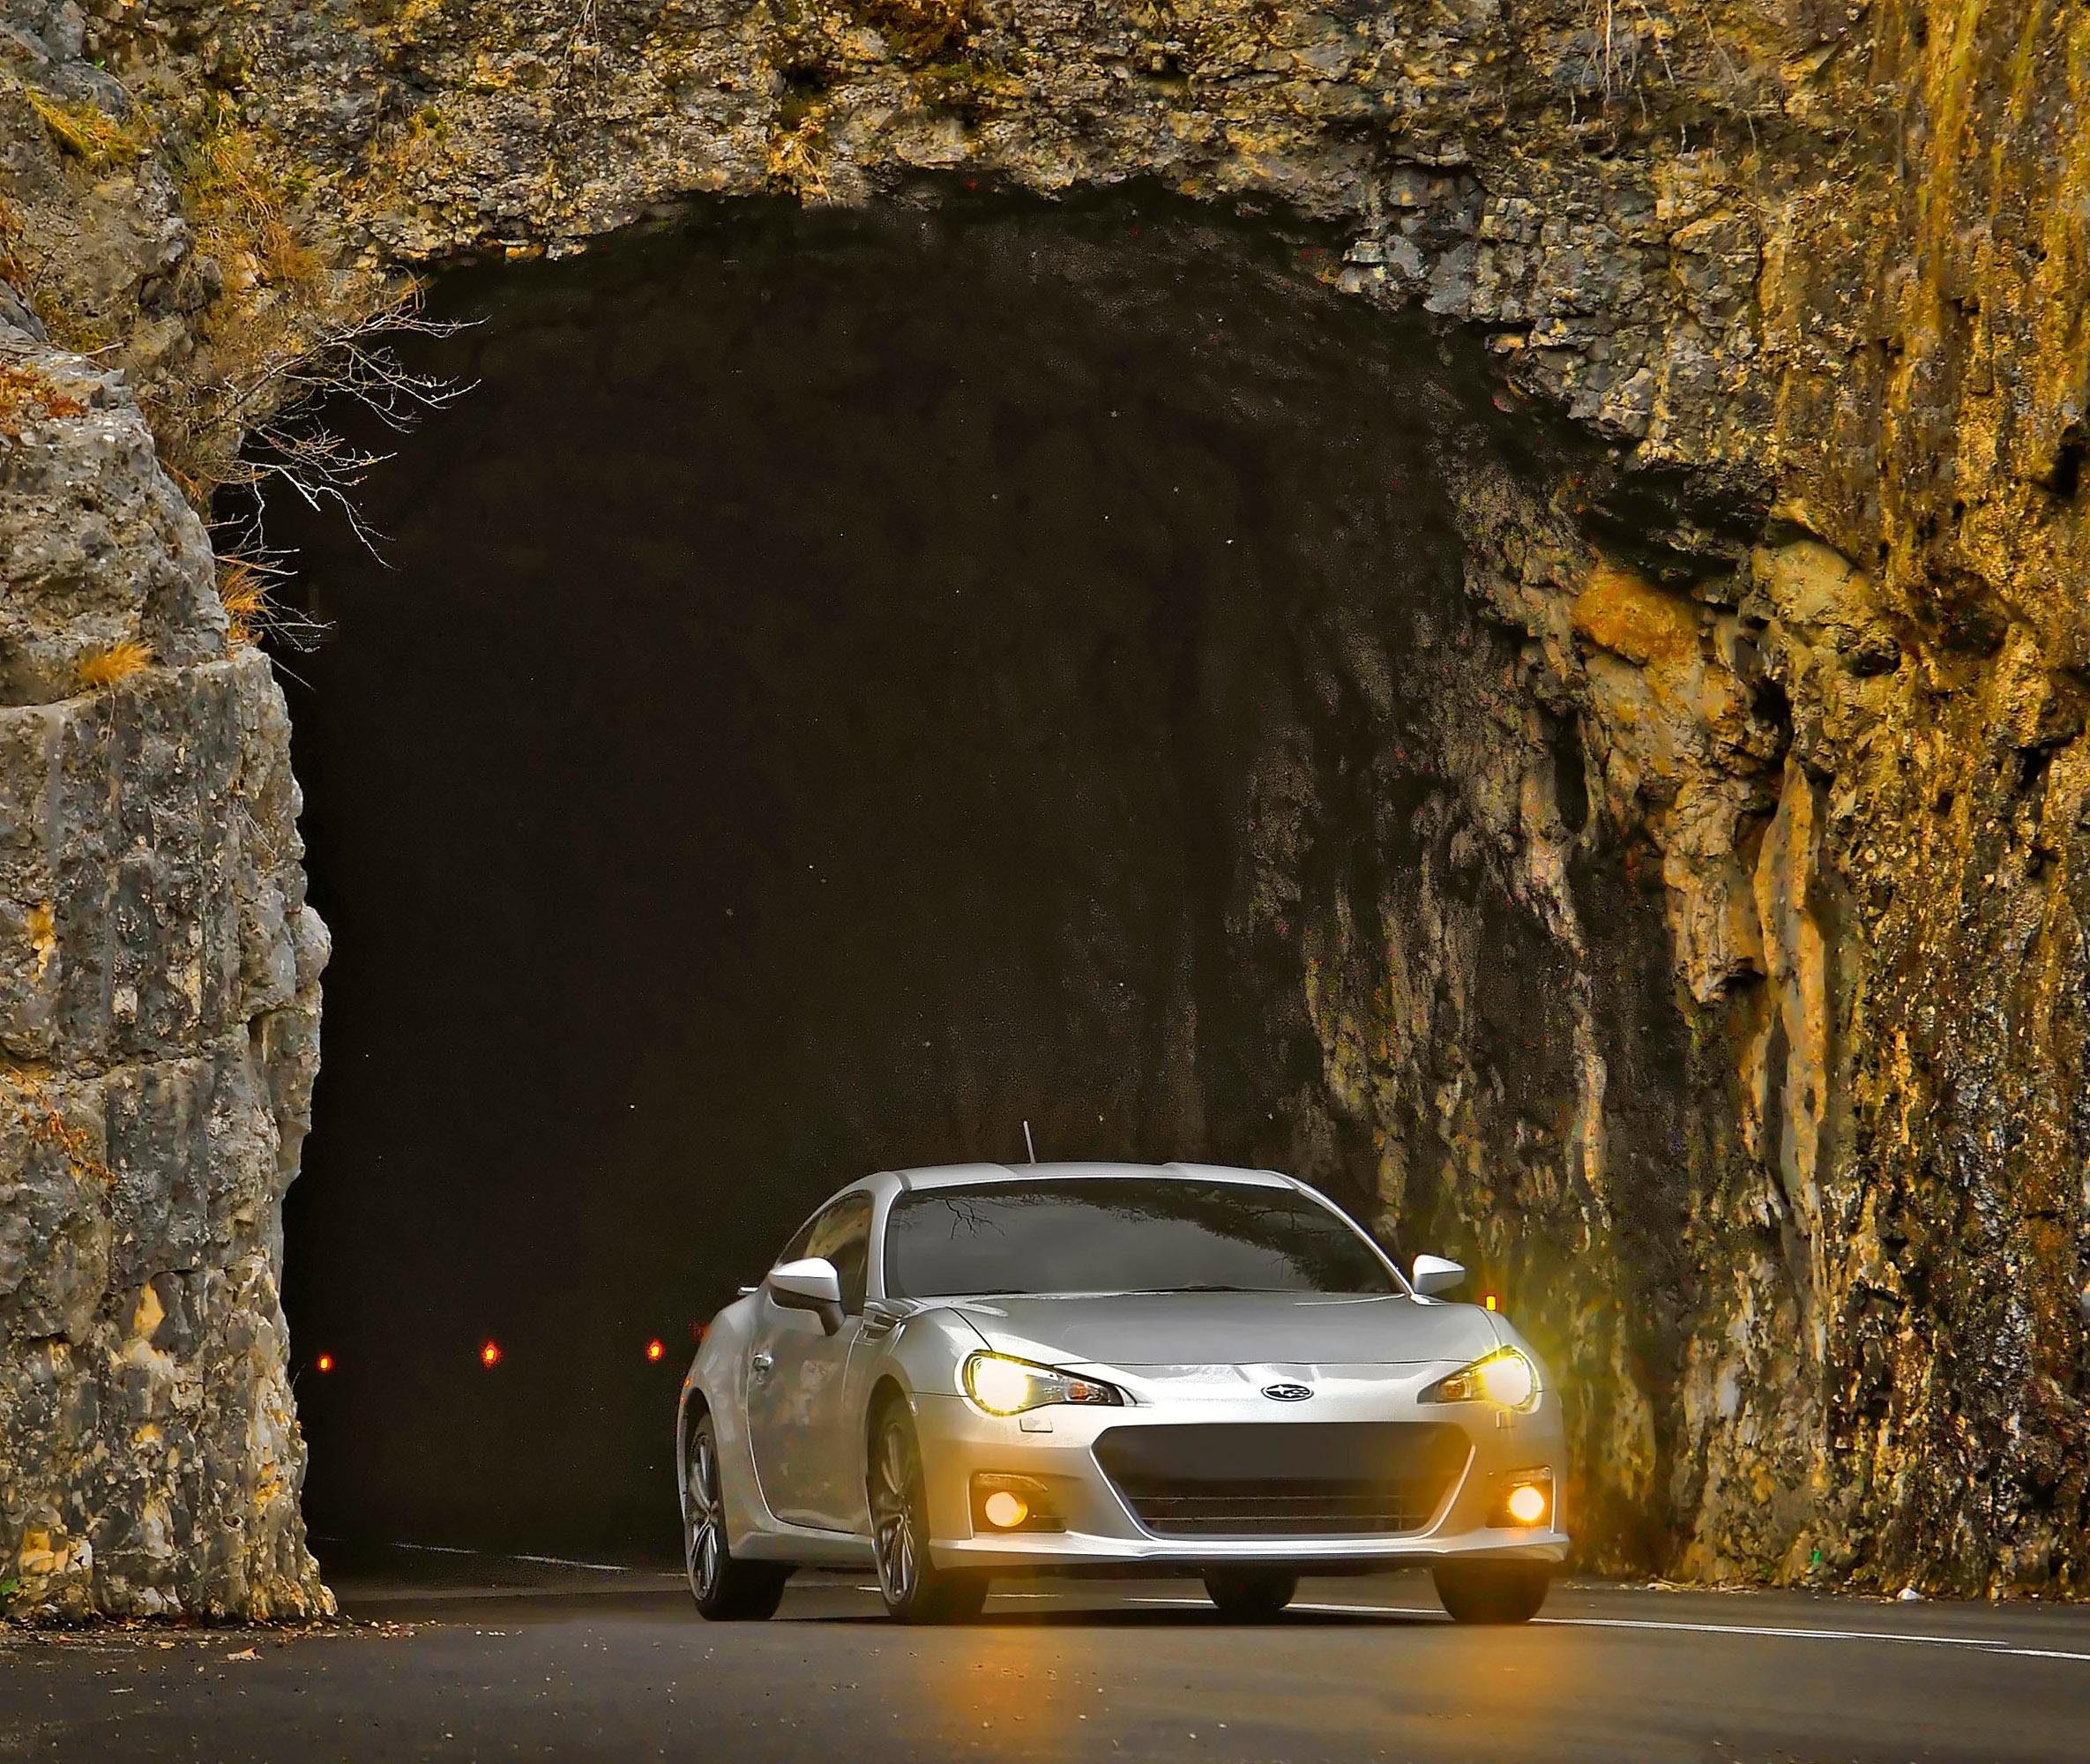 Ценообразование объявил 2014 для Subaru BRZ - фотография №1